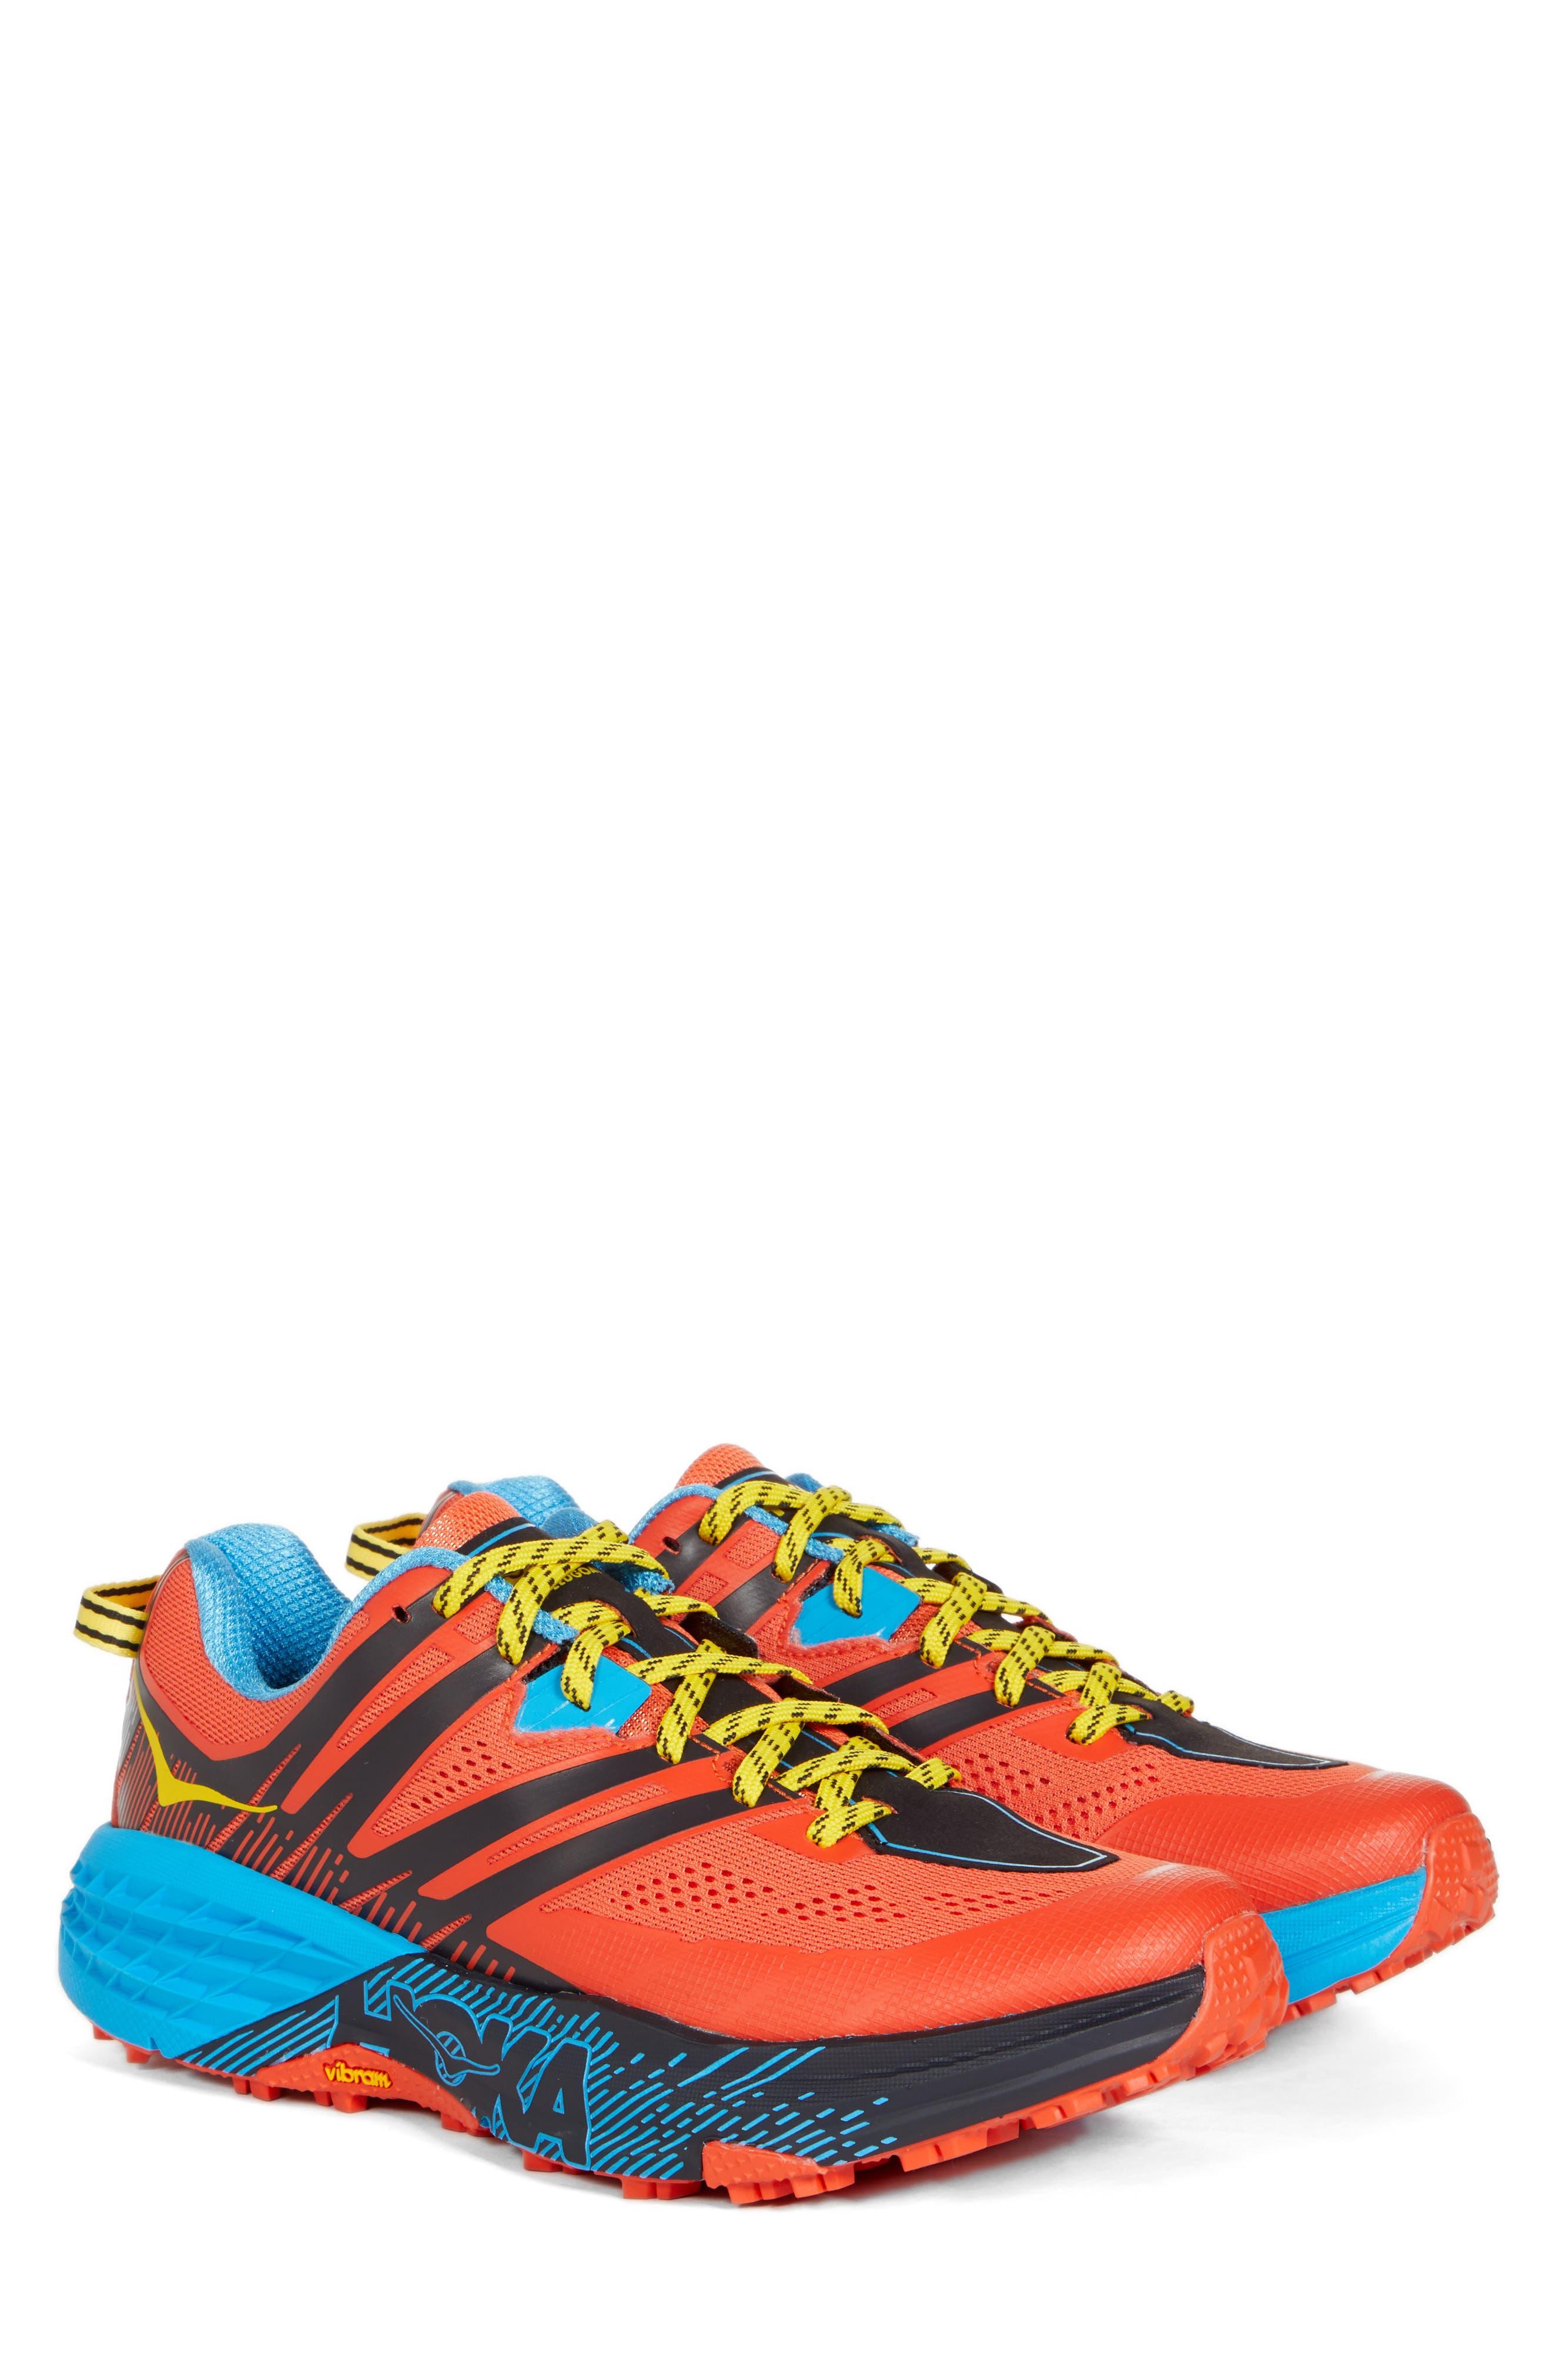 Speedgoat 3 Trail Running Shoe,                             Alternate thumbnail 2, color,                             NASTURTIUM/ SPICY ORANGE